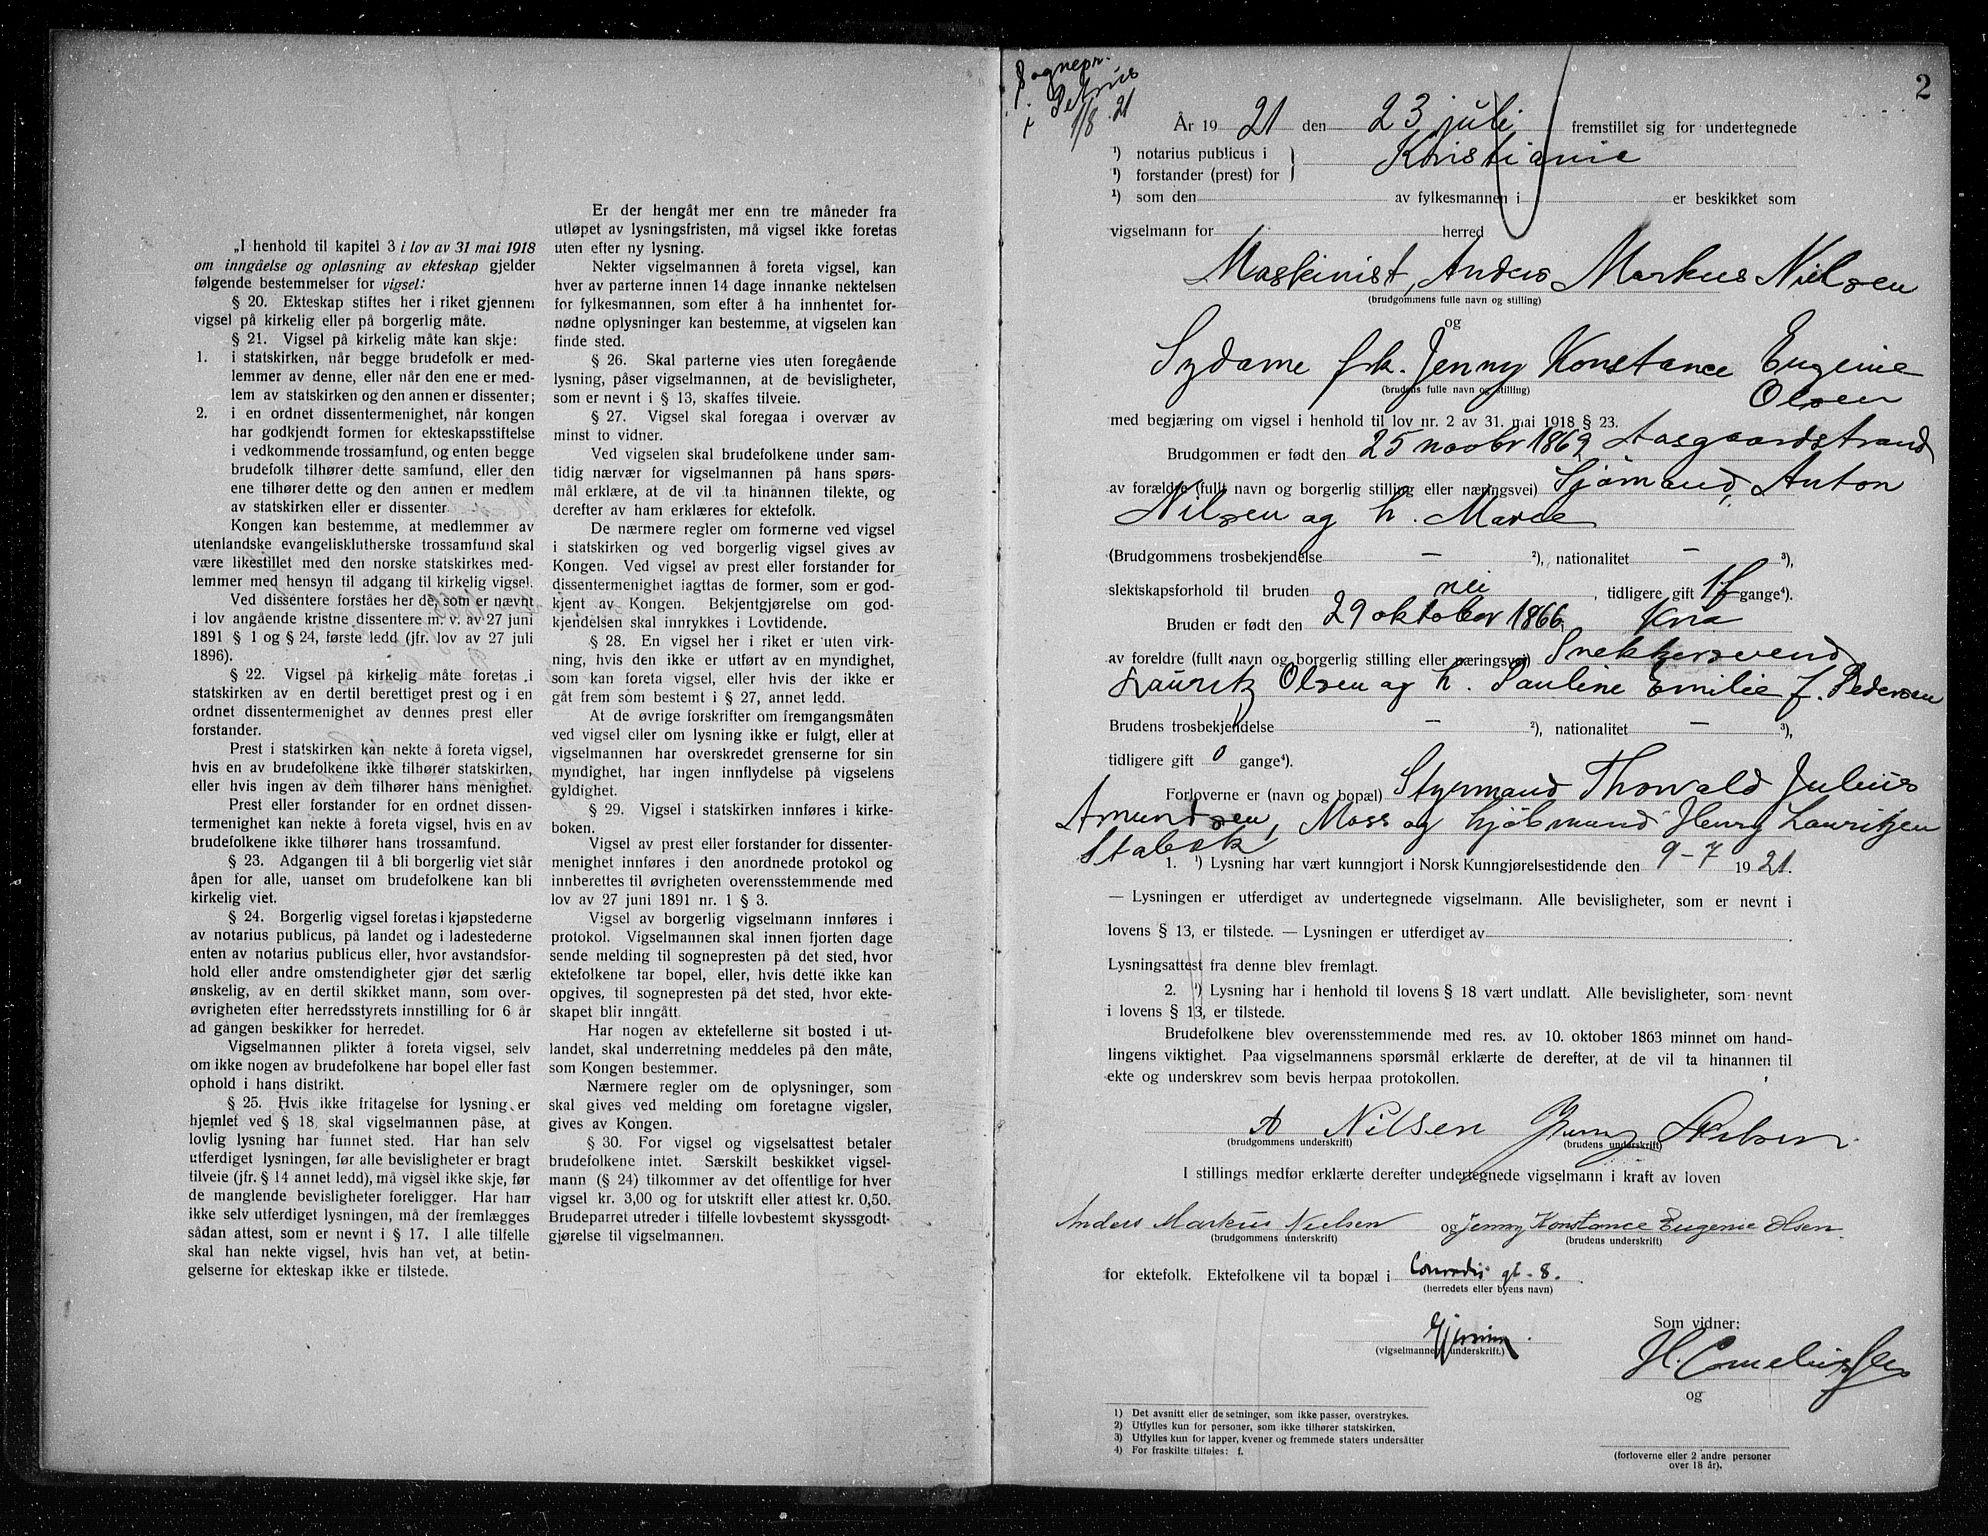 SAO, Oslo byfogd avd. I, L/Lb/Lbb/L0015: Notarialprotokoll, rekke II: Vigsler, 1921-1922, s. 1b-2a